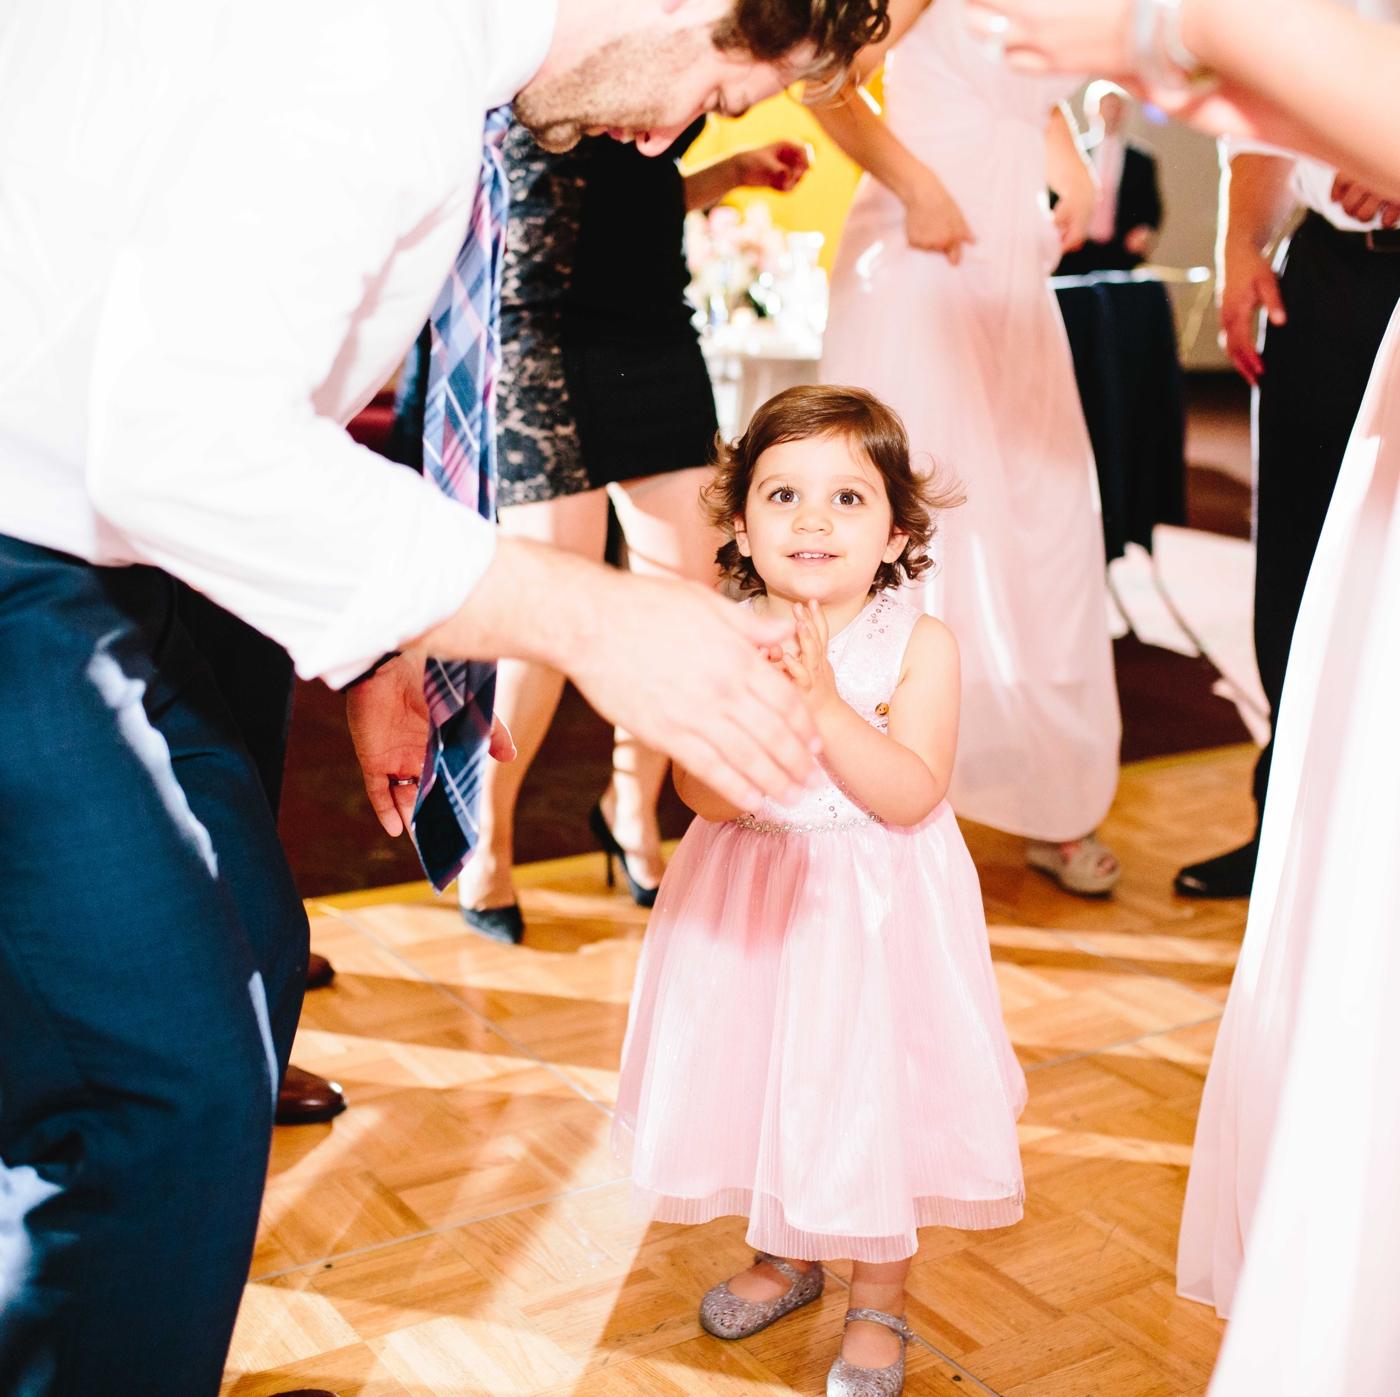 chicago-fine-art-wedding-photography-svihra29